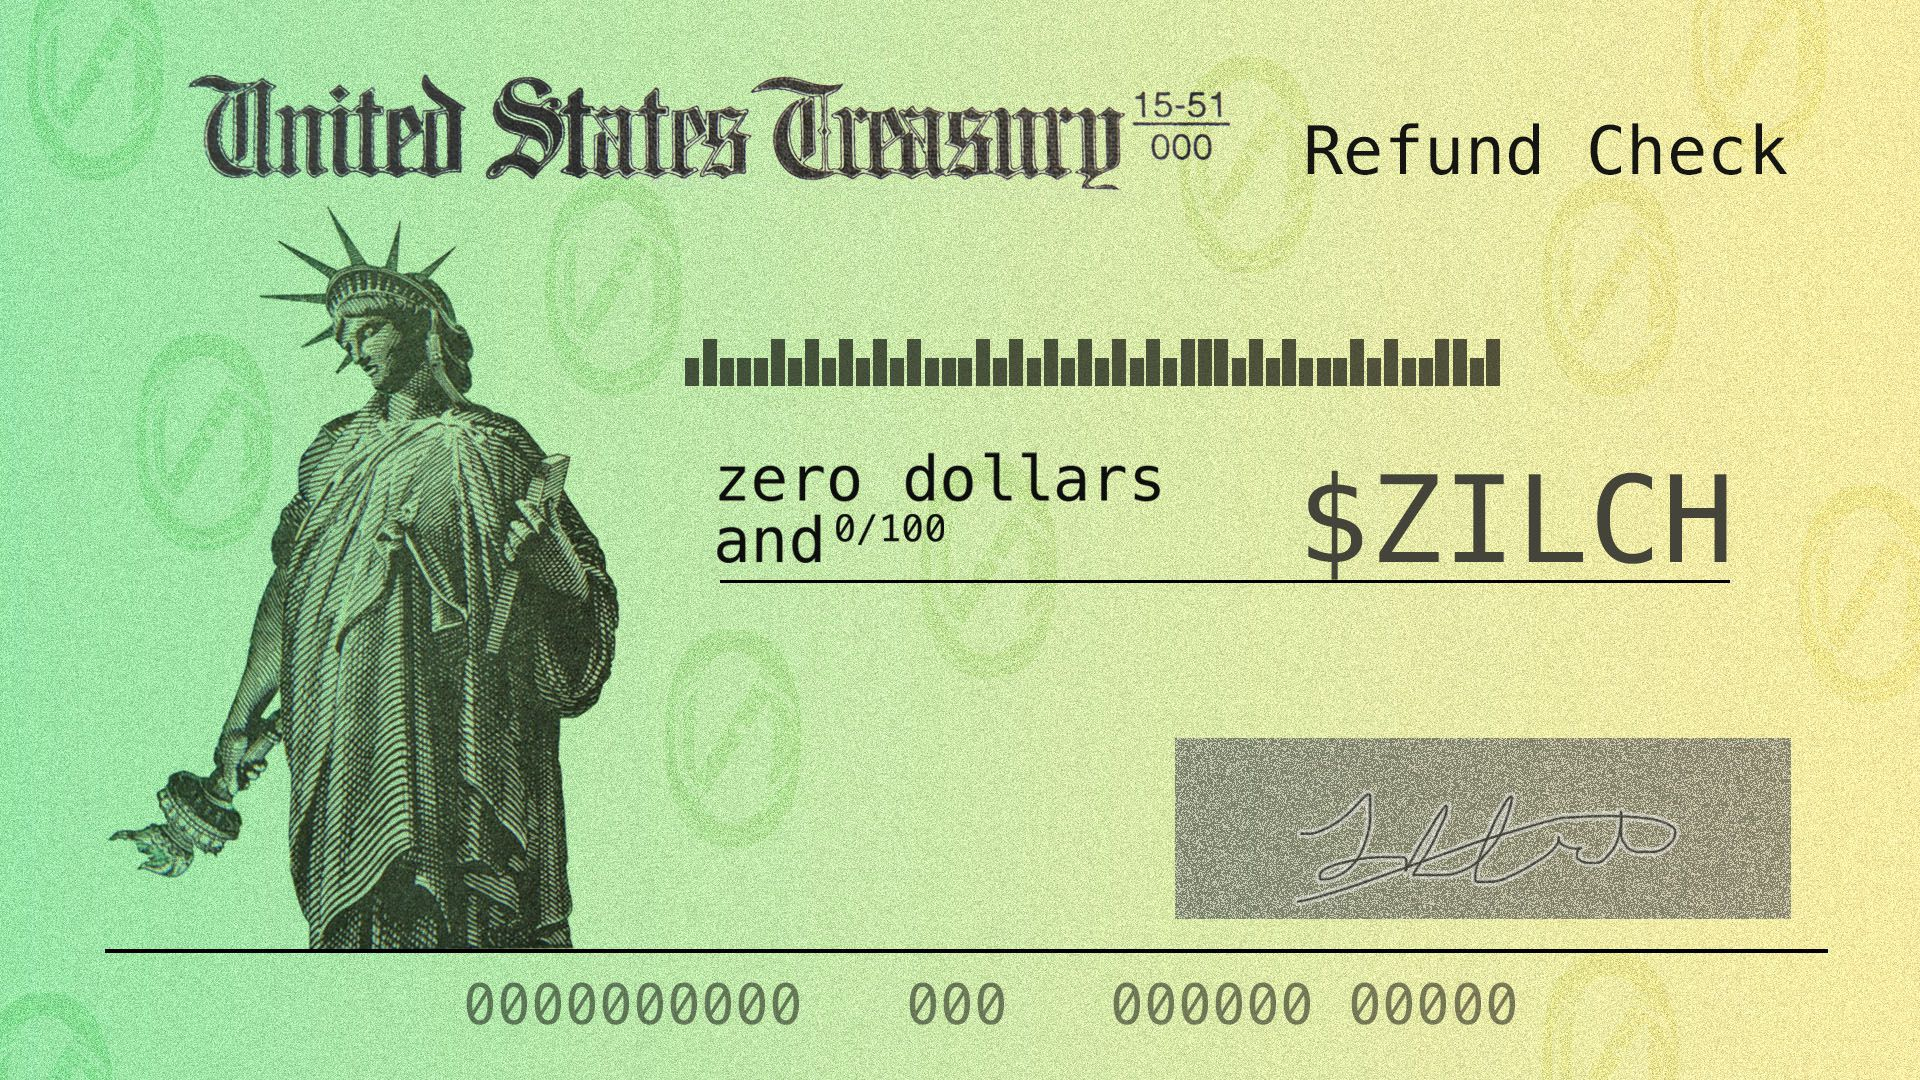 Illustration of United States Treasury check with no money